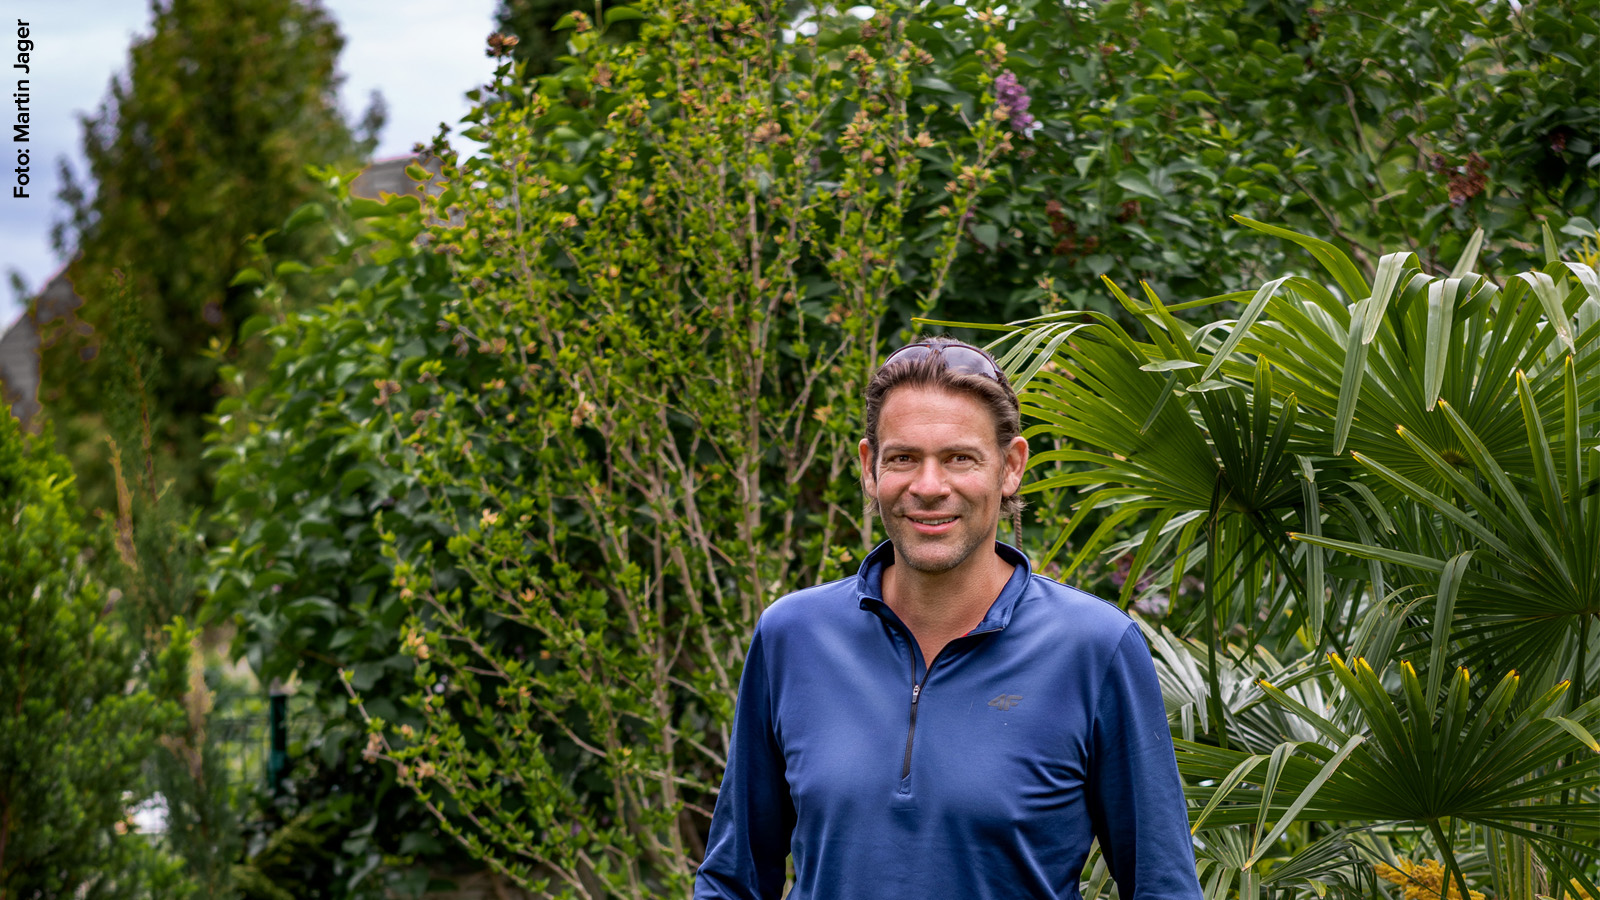 Stephan Mally – Glück im Garten   story.one